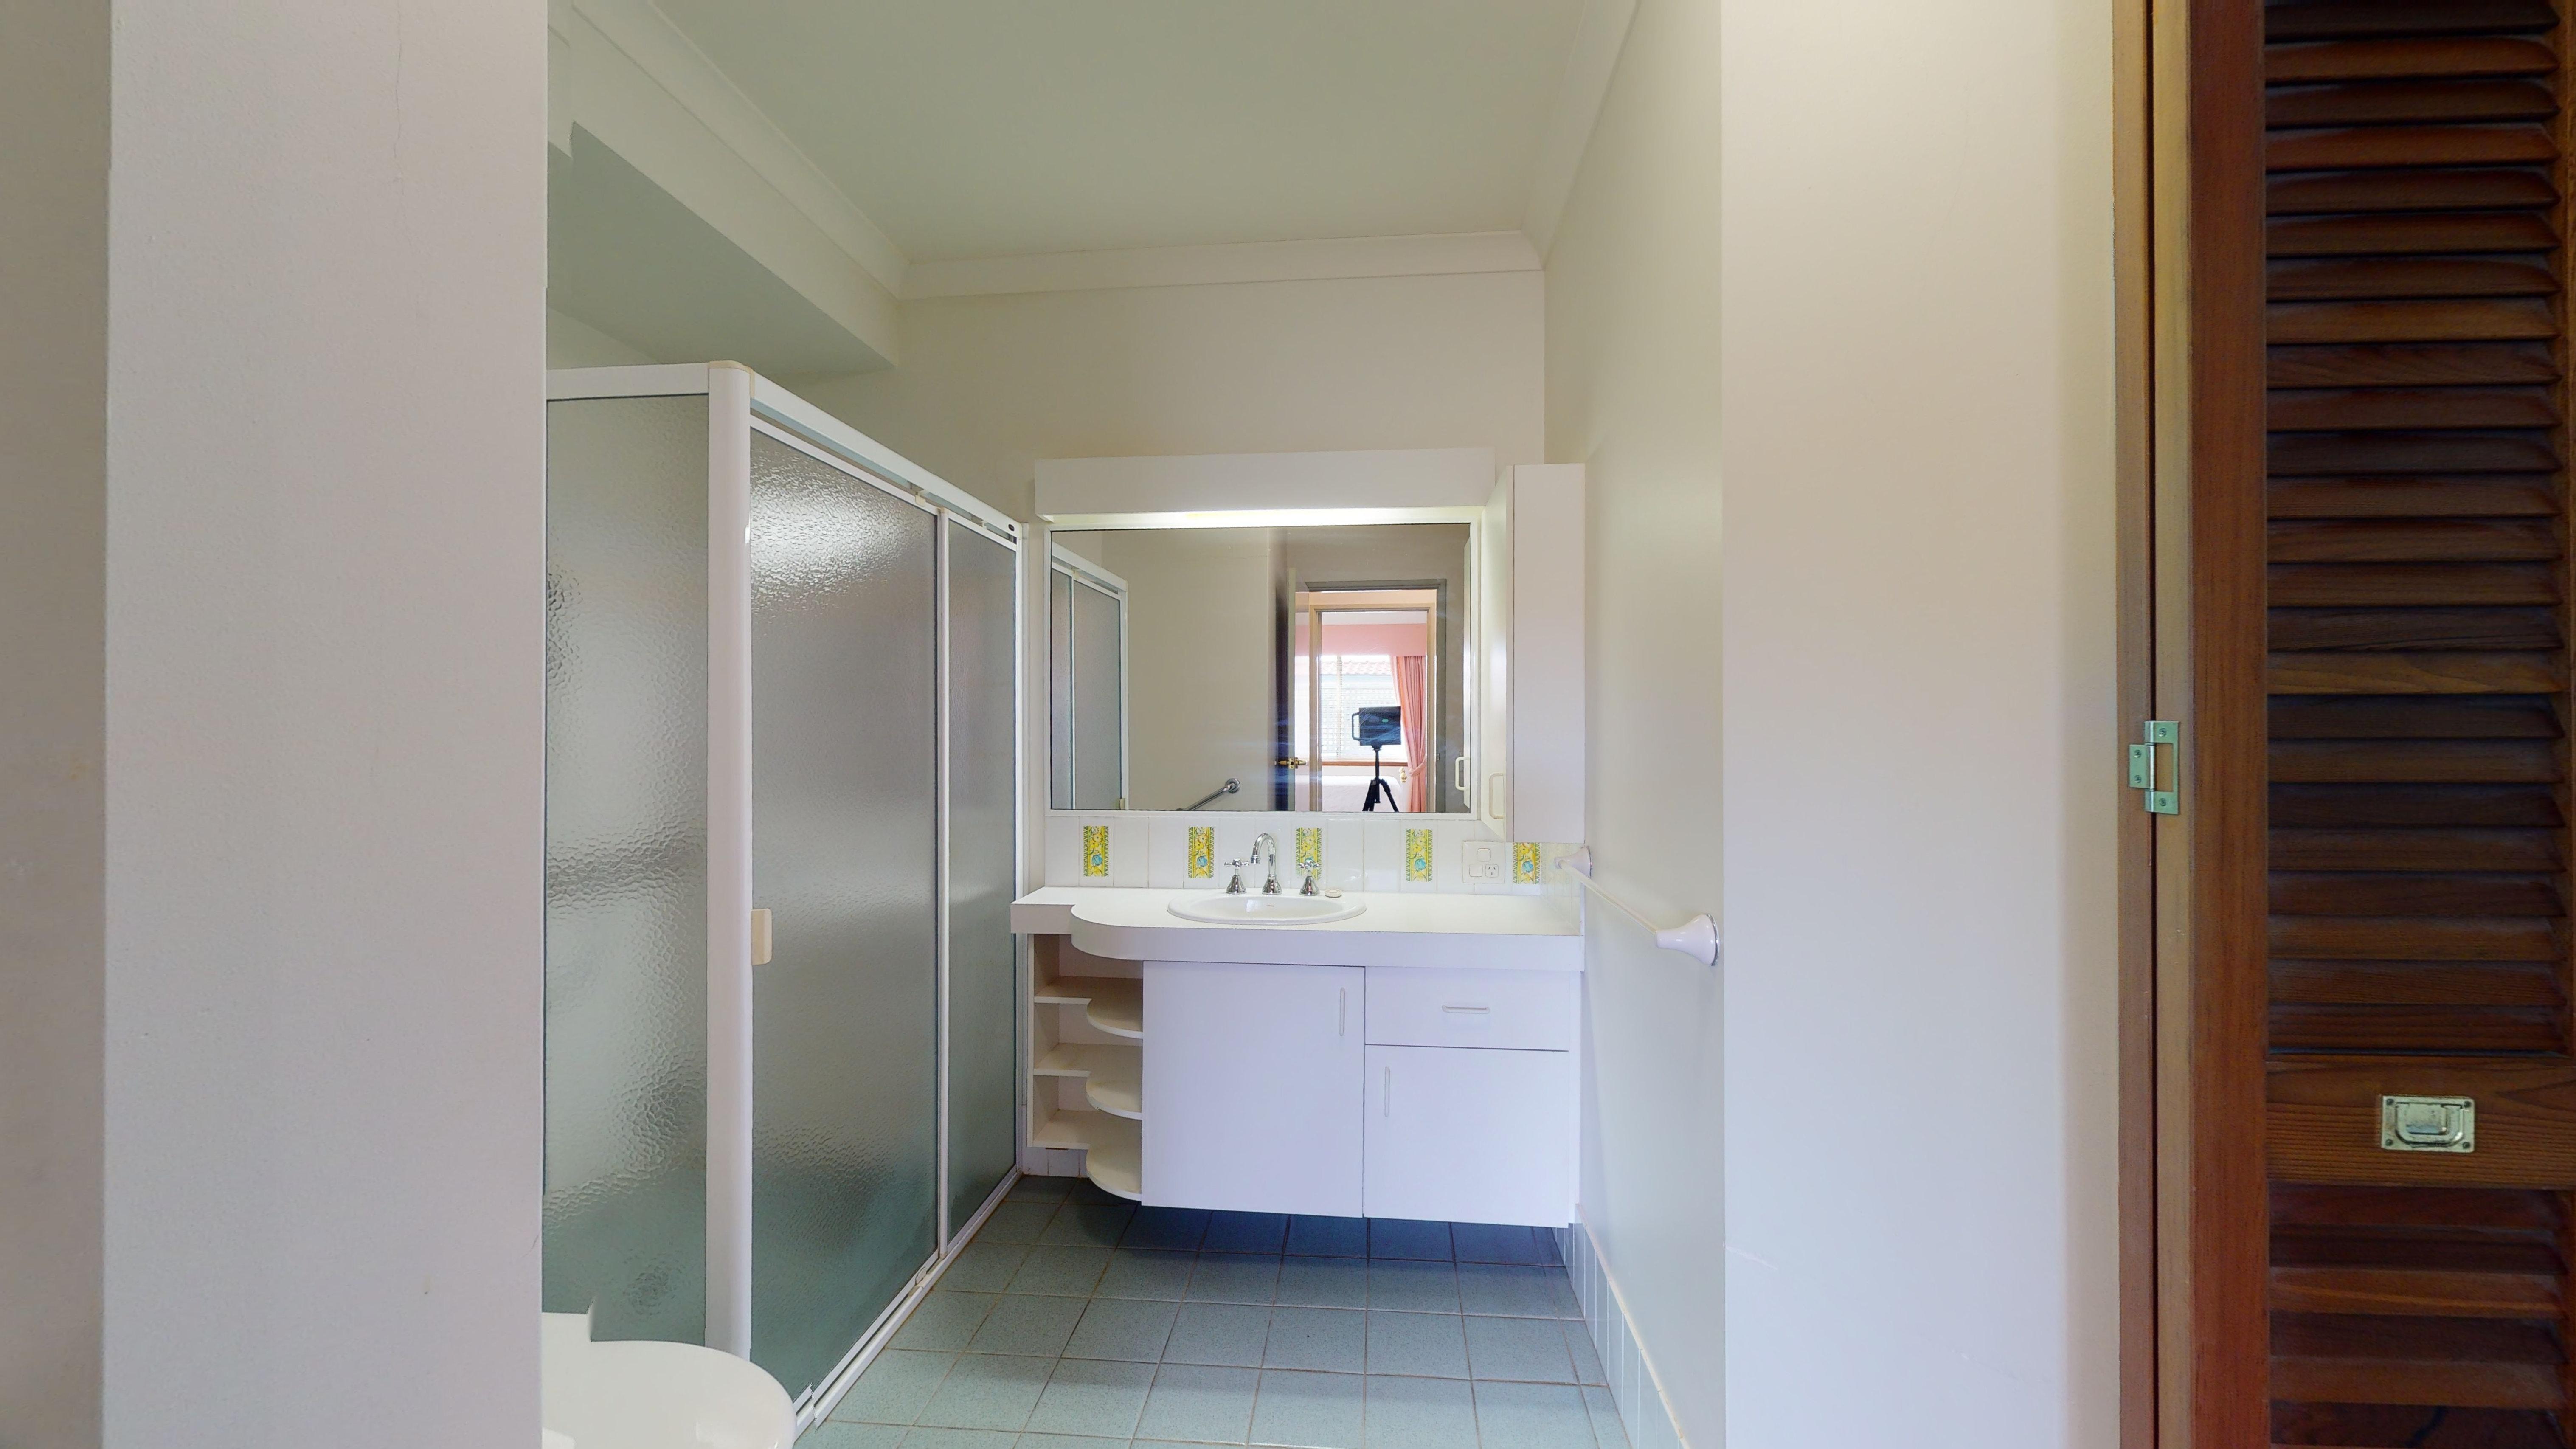 29959138 1622442294 29336 207 177 Dampier Avenue Kallaroo BathroomLaundry